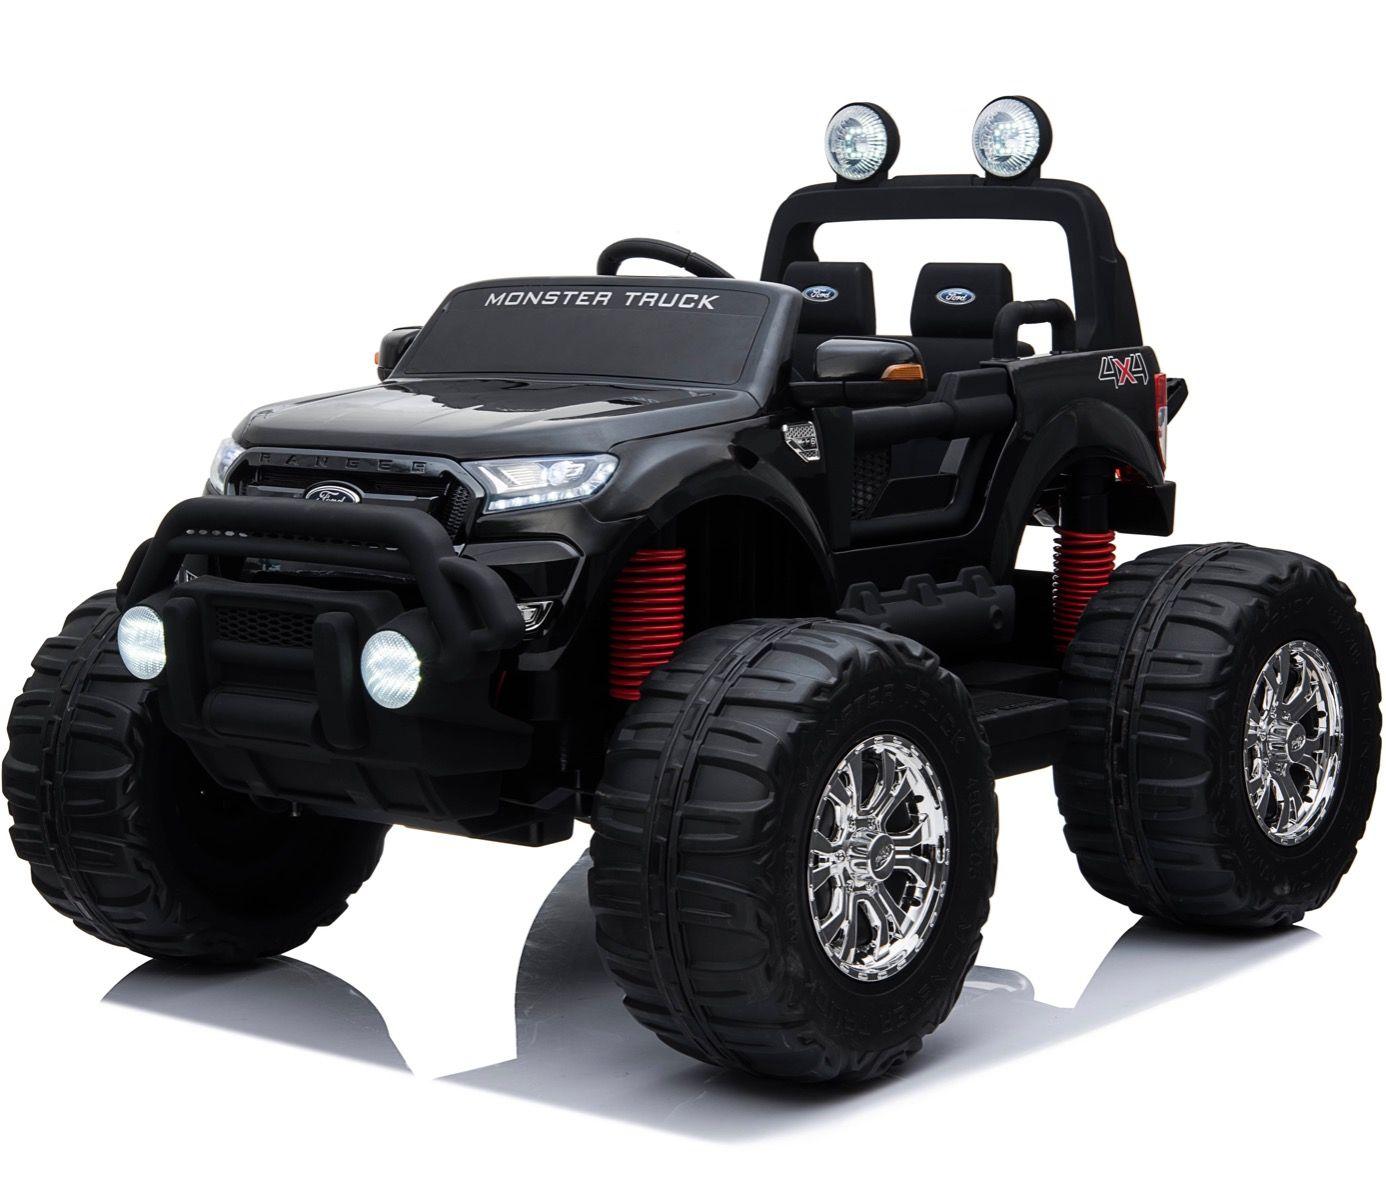 Licensed 24v Ford Ranger Monster Truck Ride On Jeep Black For Just 379 95 Outdoor Toys